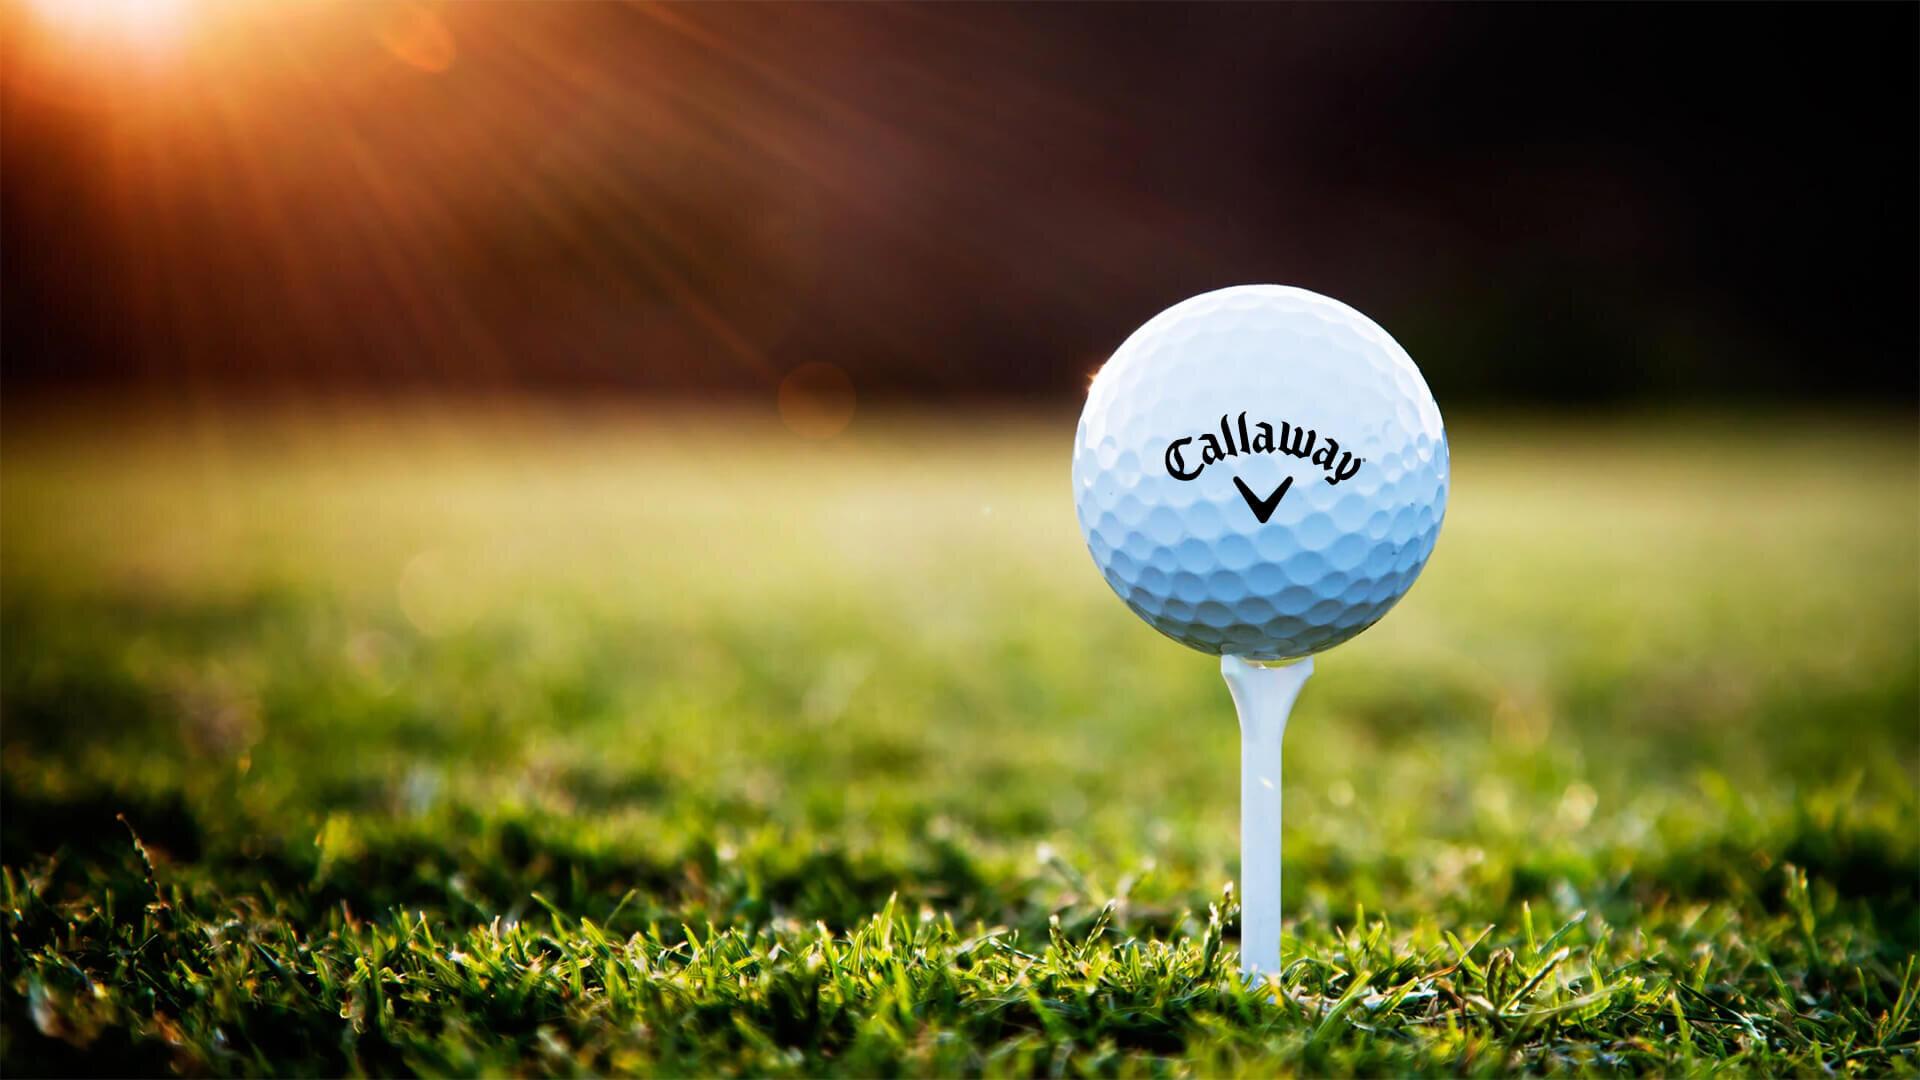 Golf Callaway